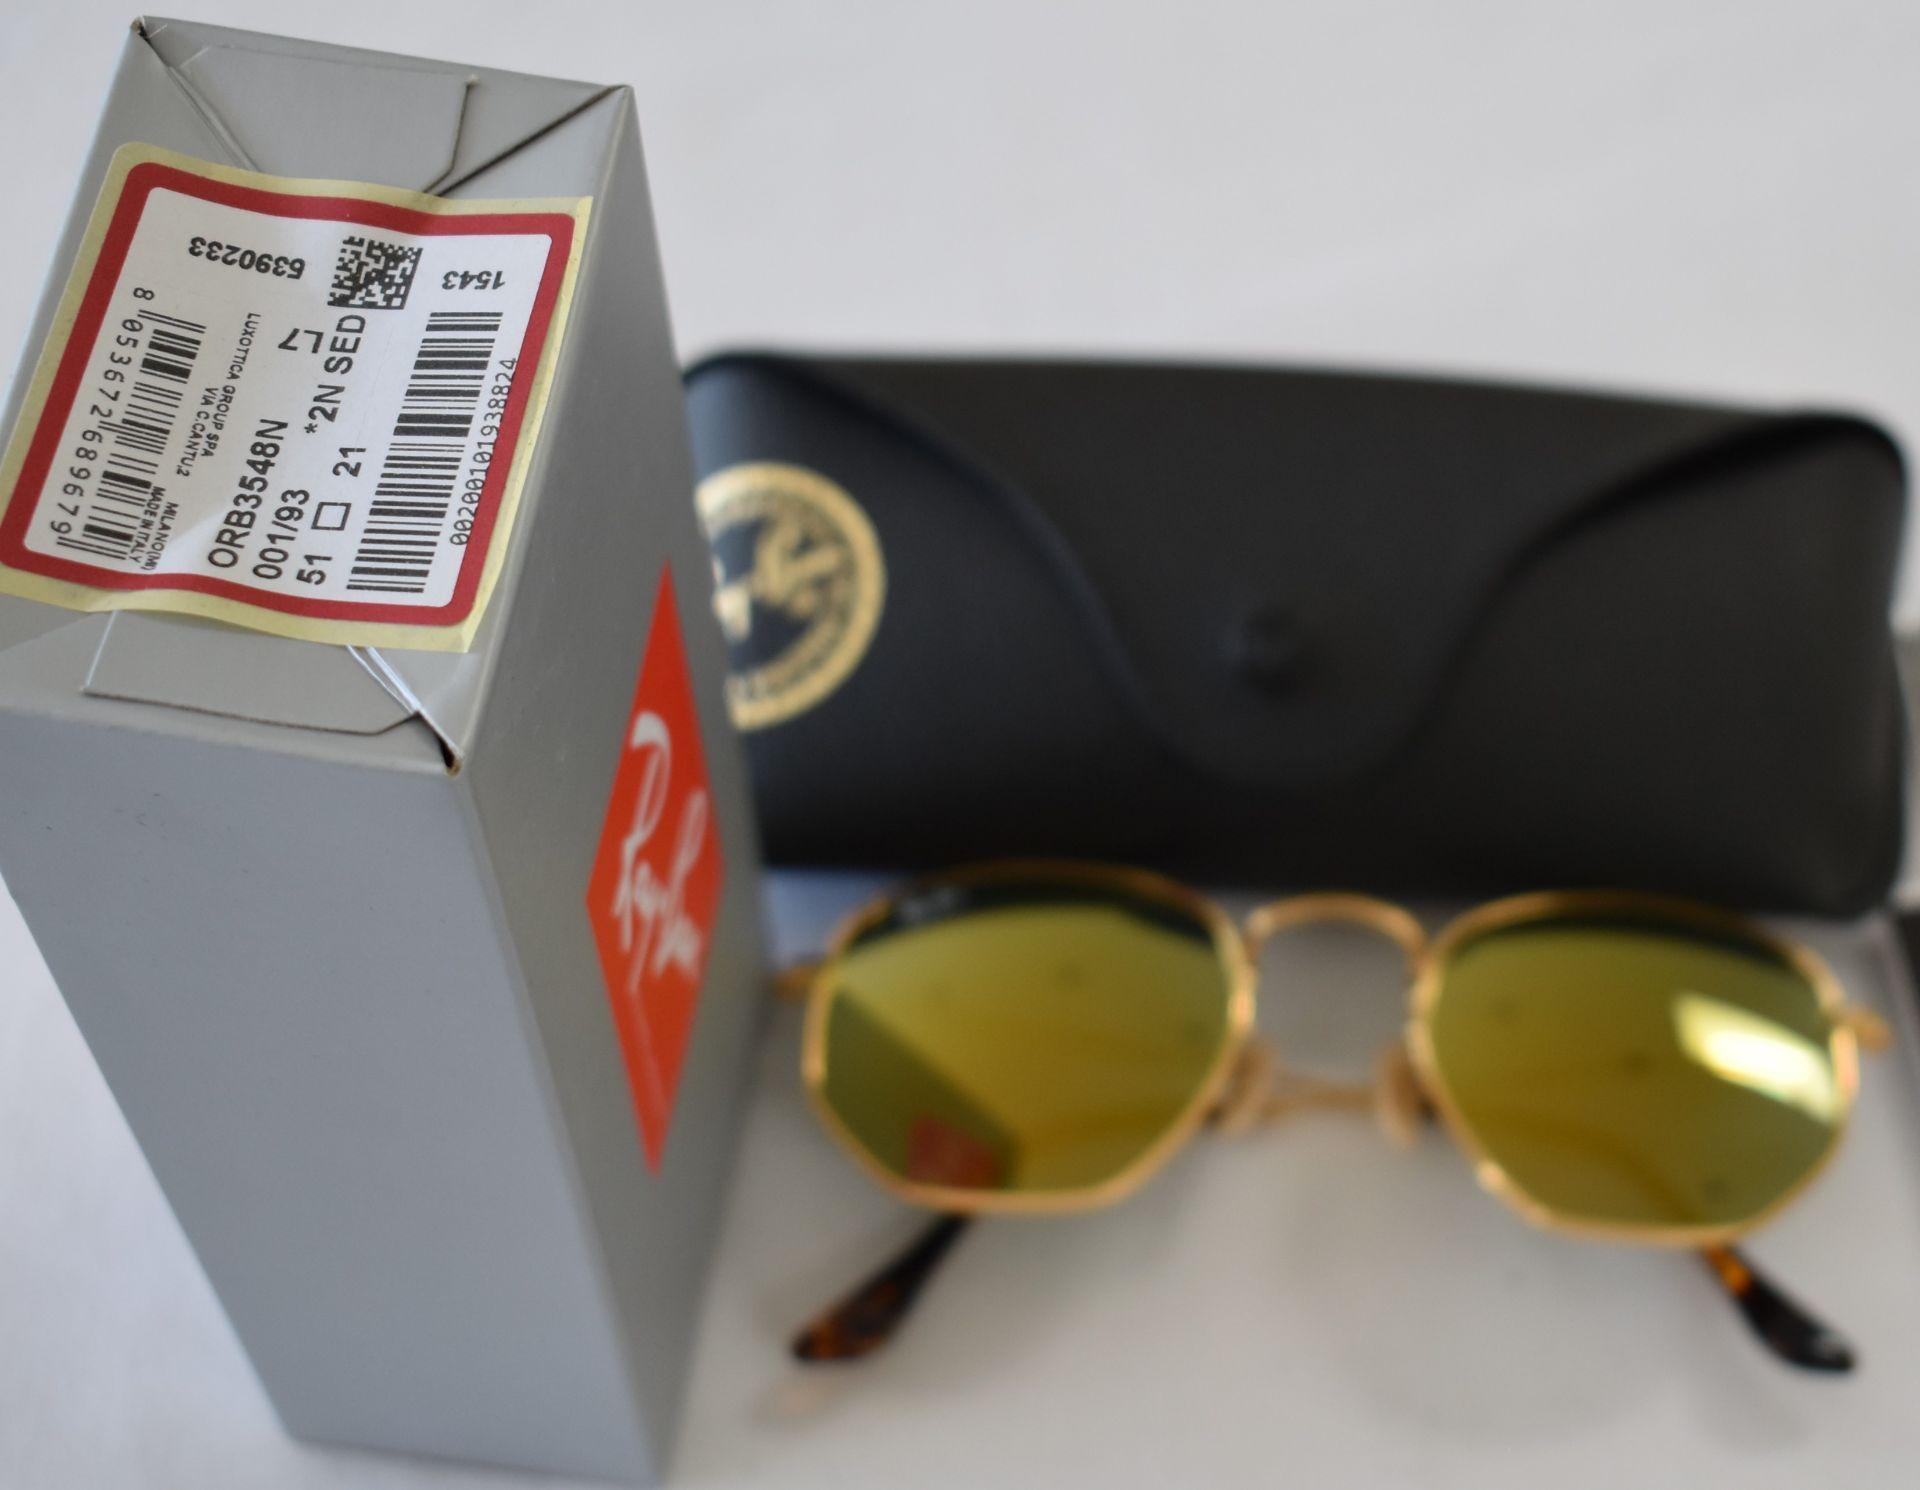 Ray Ban Sunglasses ORB3548N 001/93 *2N - Image 2 of 2